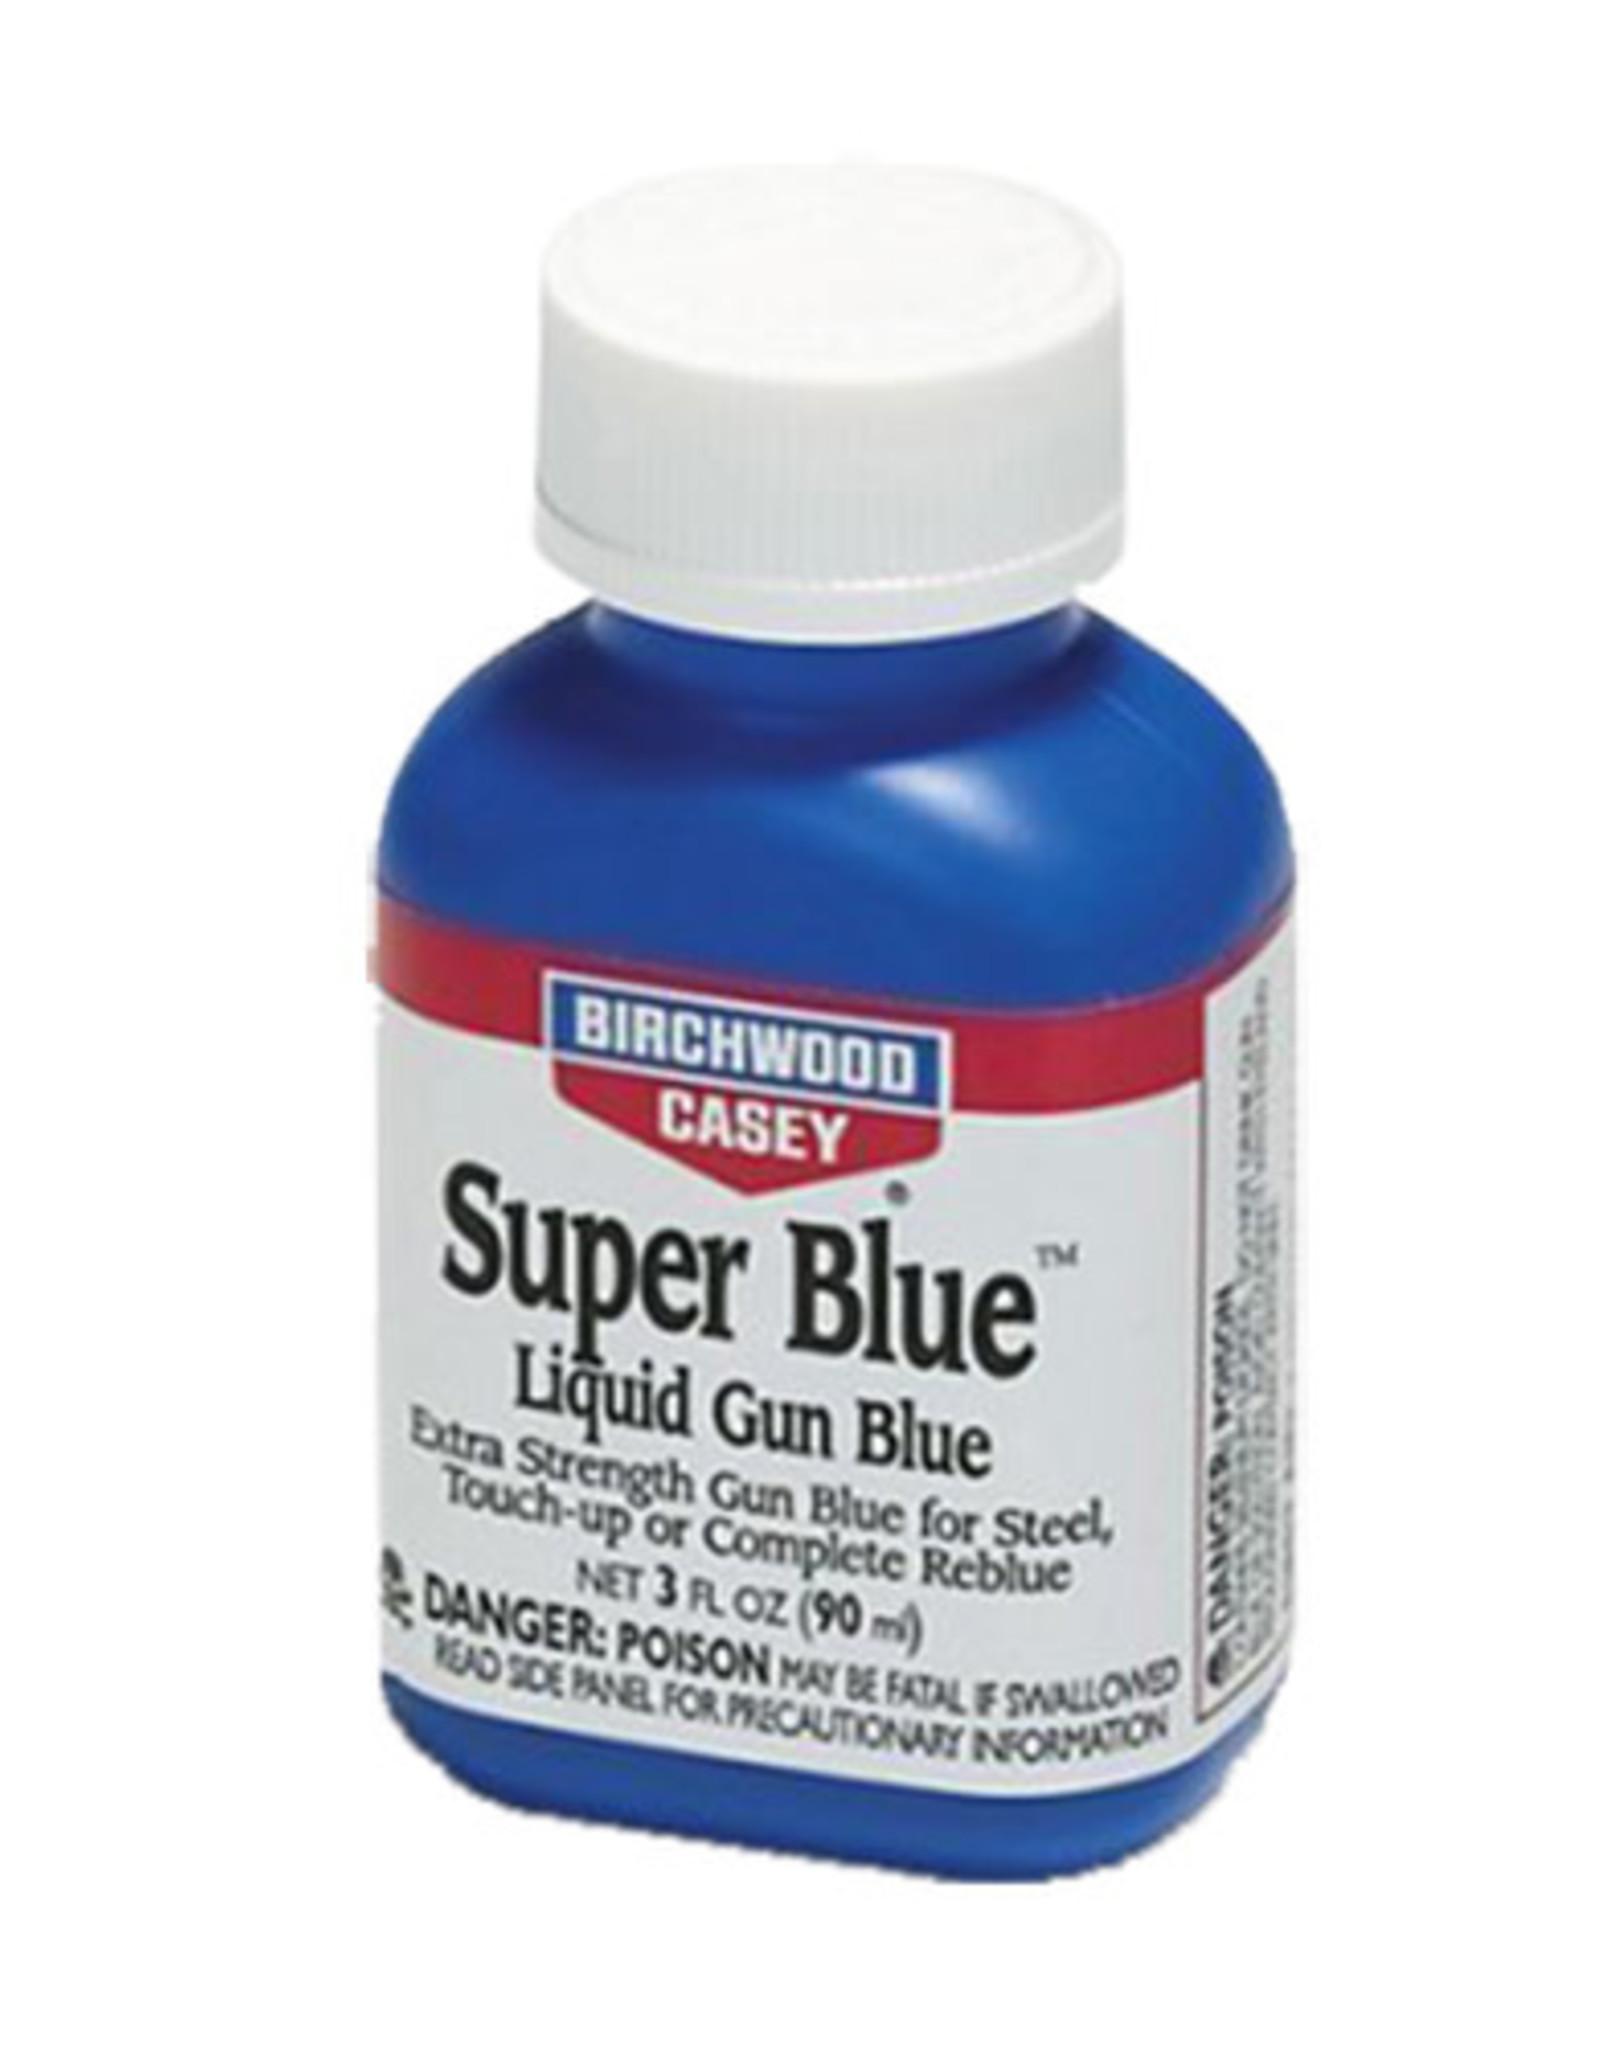 BIRCHWOOD CASEY BWC Super Blue 3 Oz.